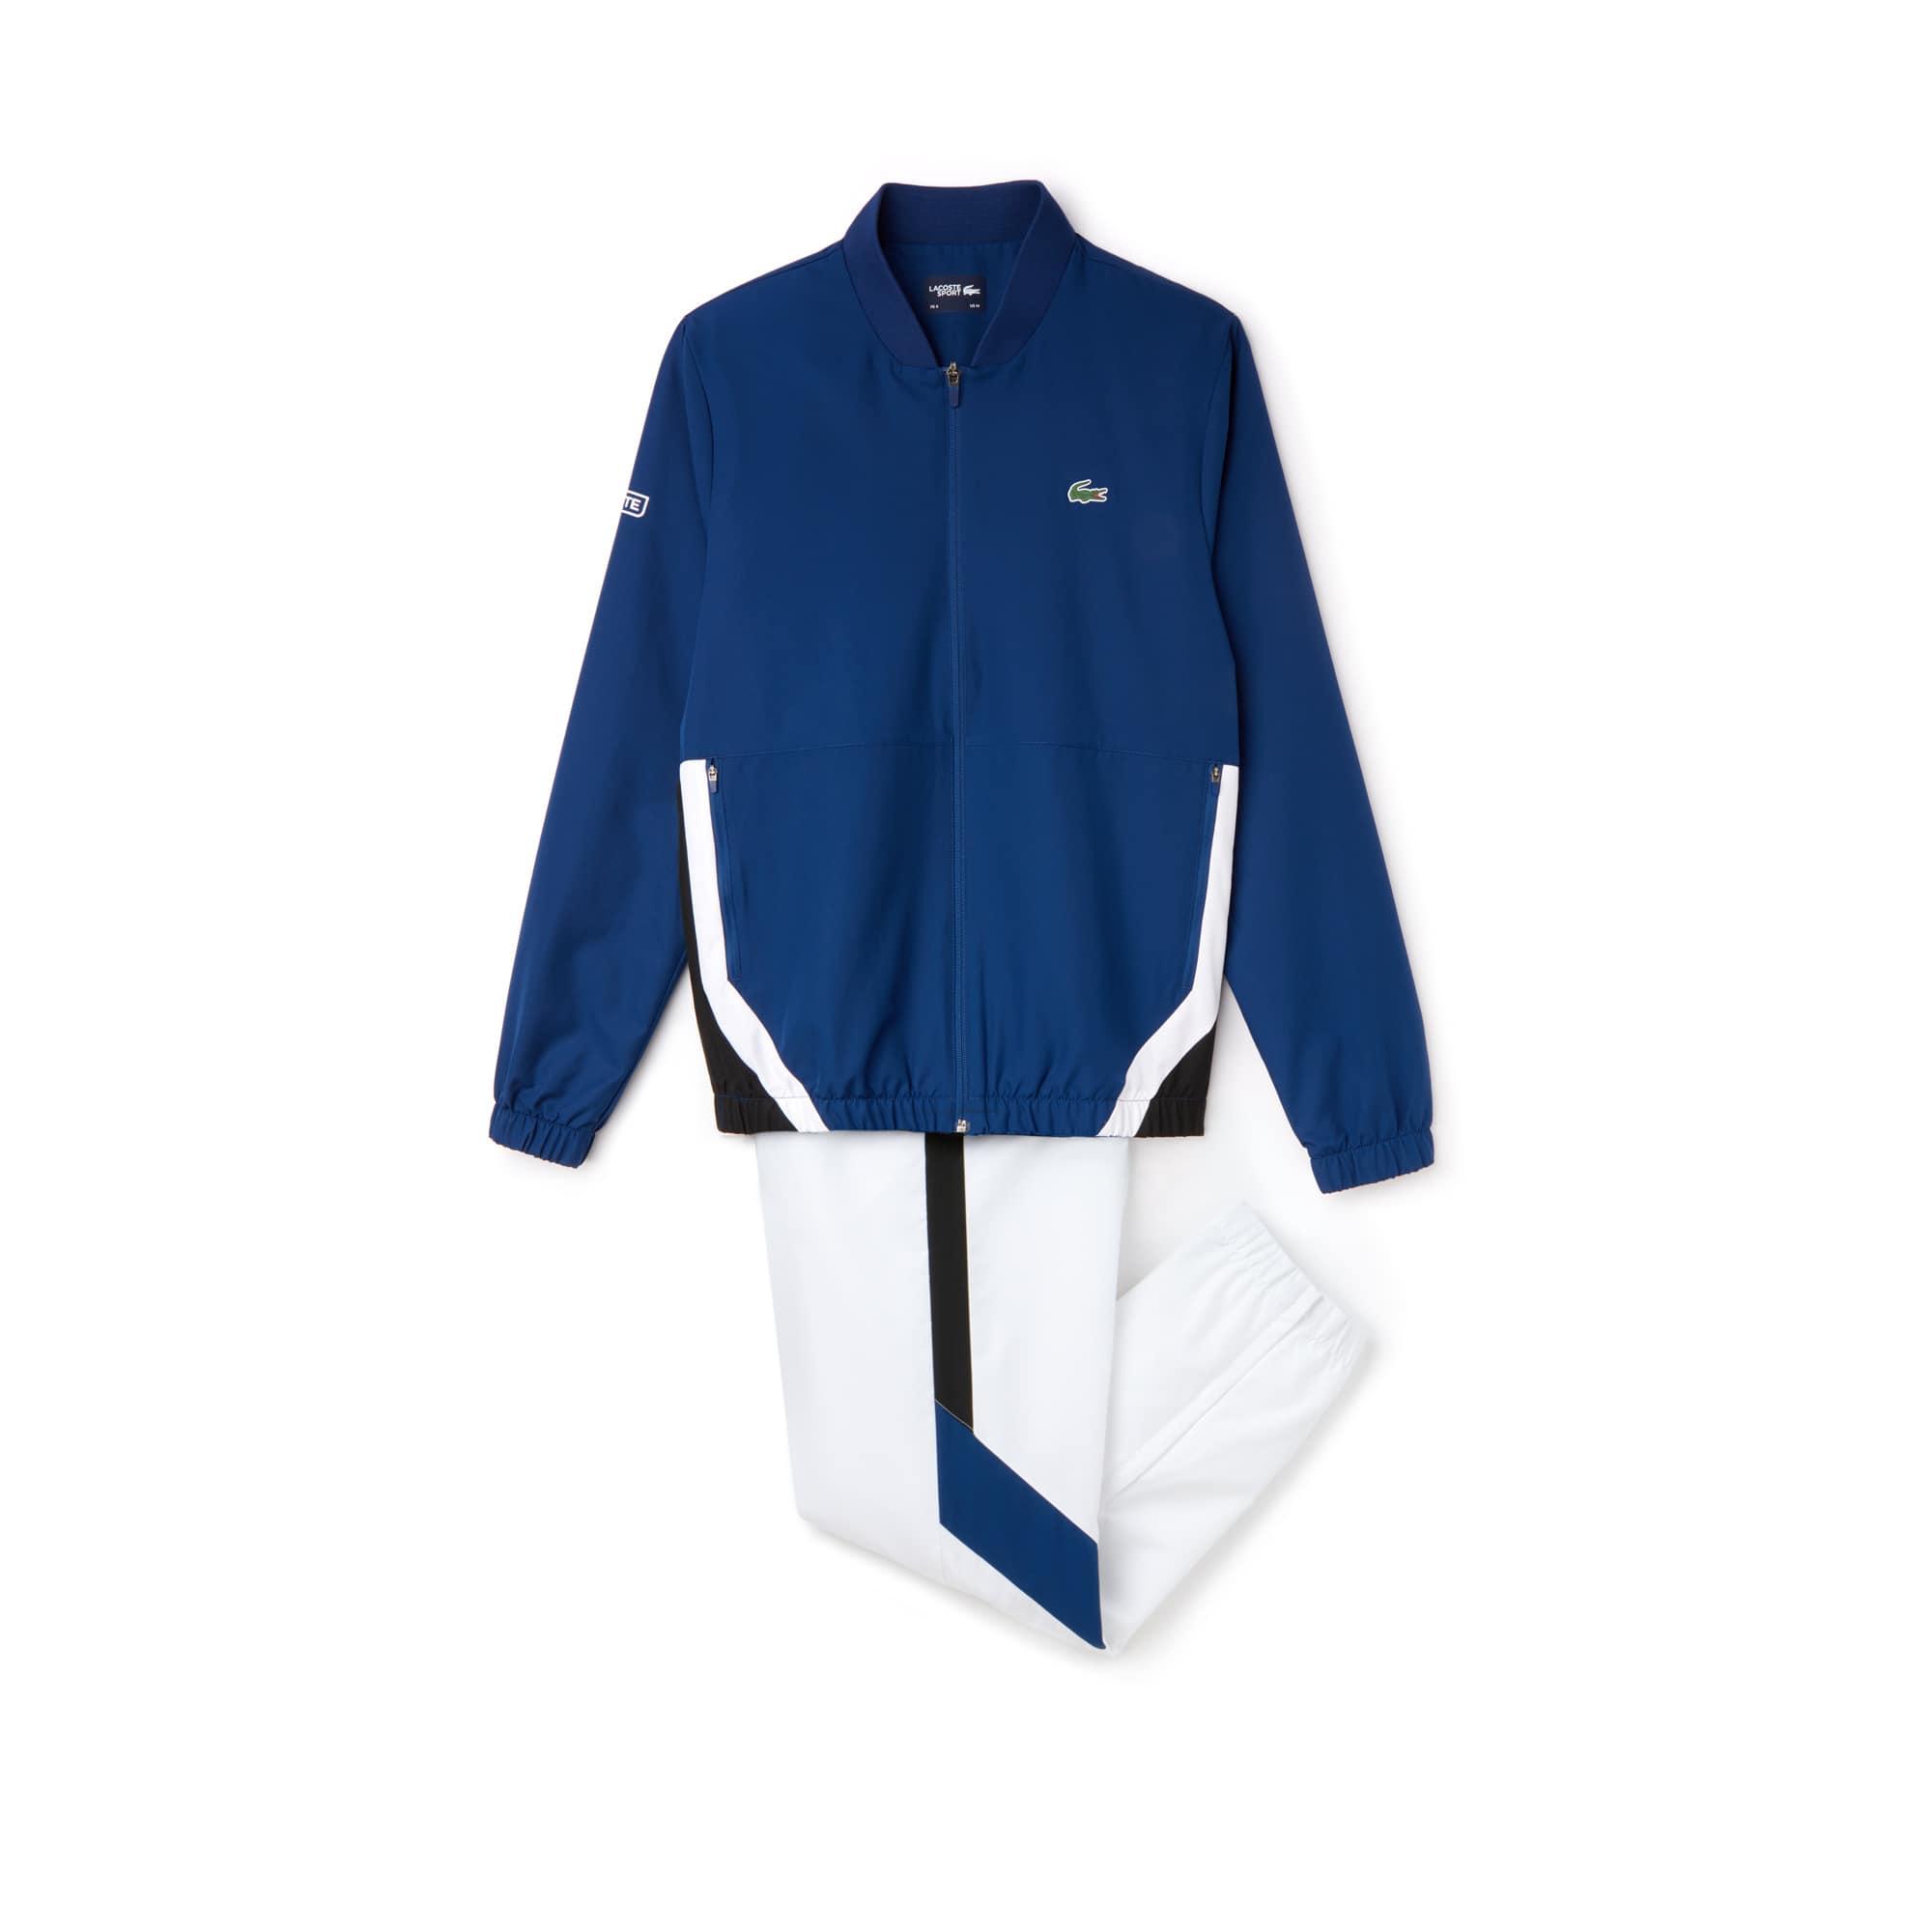 Herren LACOSTE SPORT Taft Trainingsanzug mit Colorblocks